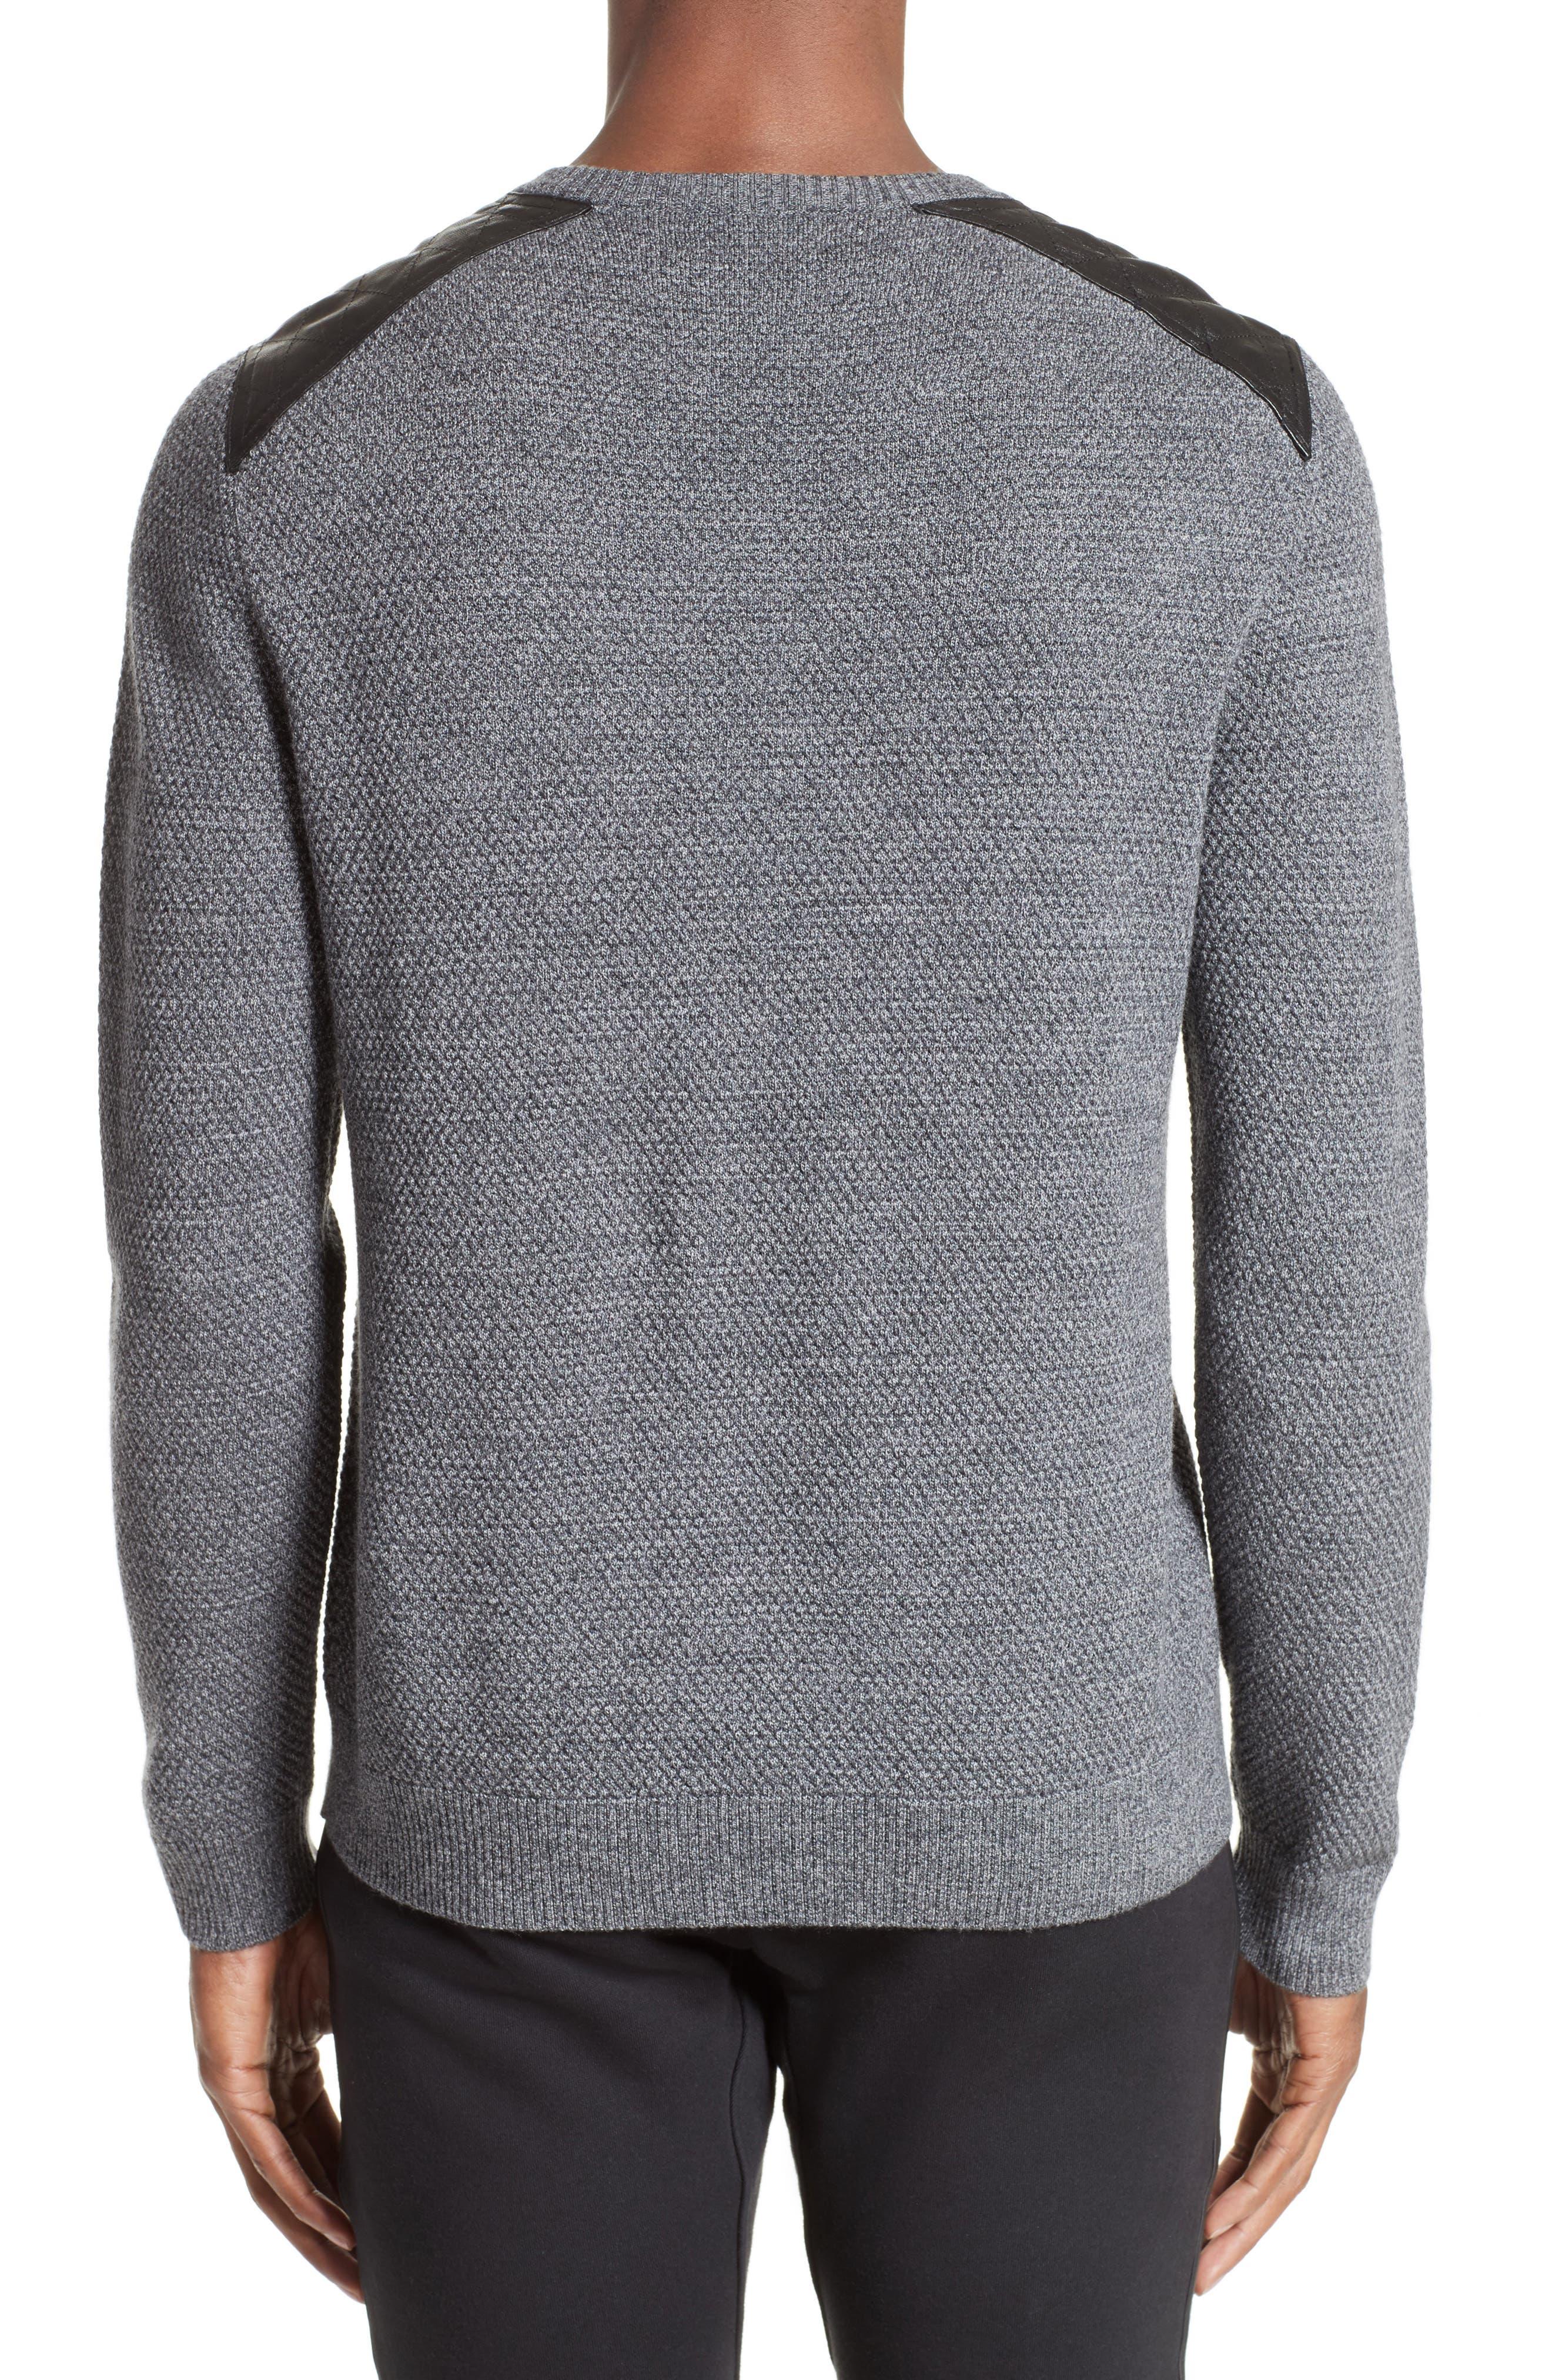 Merino Wool Sweater,                             Alternate thumbnail 2, color,                             020